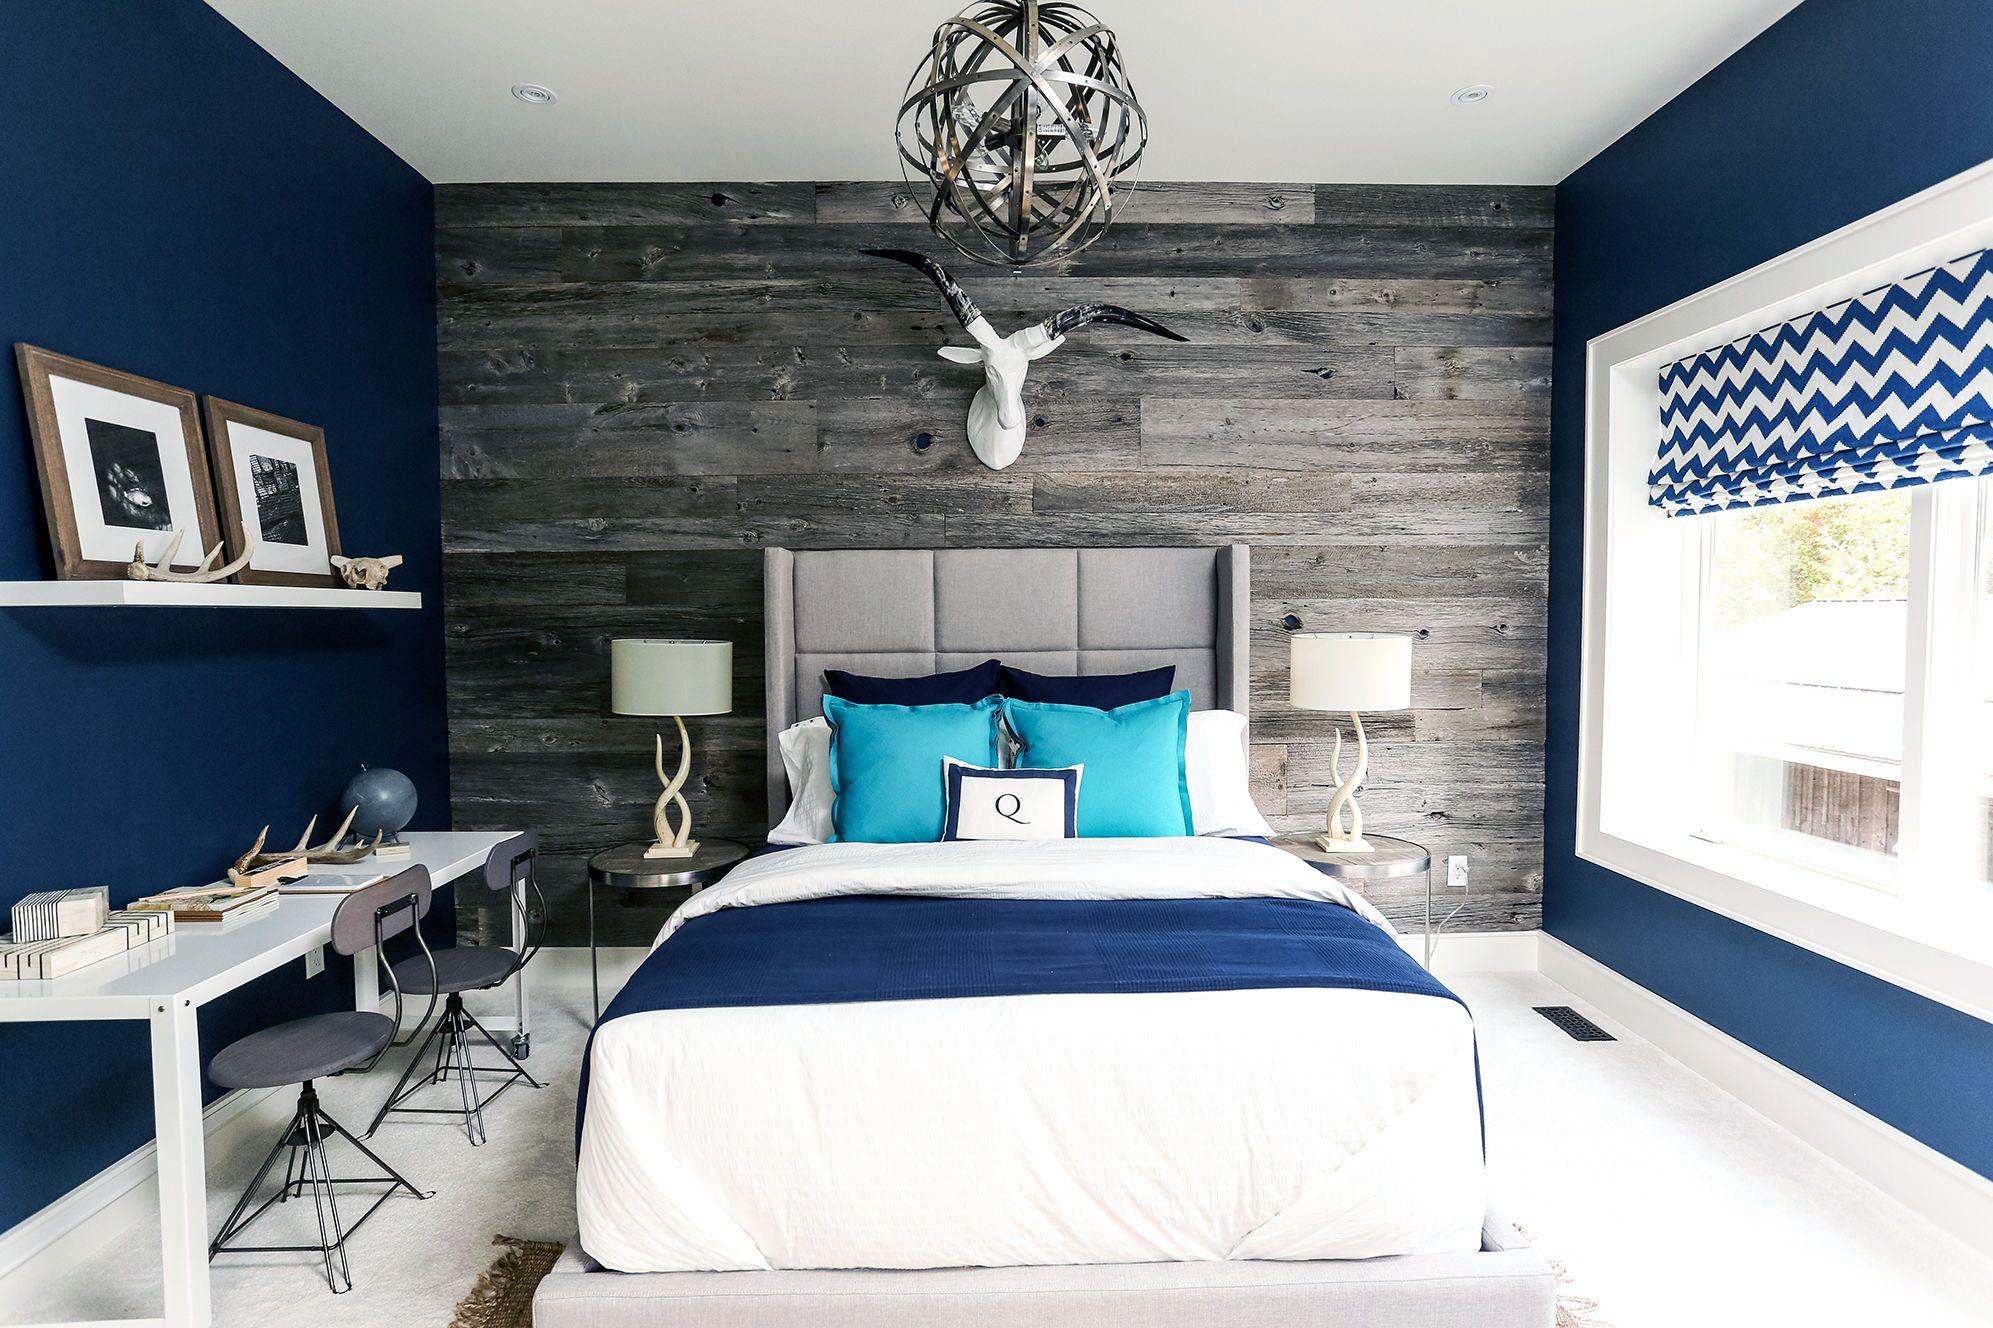 Creative Bedroom Ideas For Boys Remodel Bedroom Home Decor Bedroom Bedroom Colors